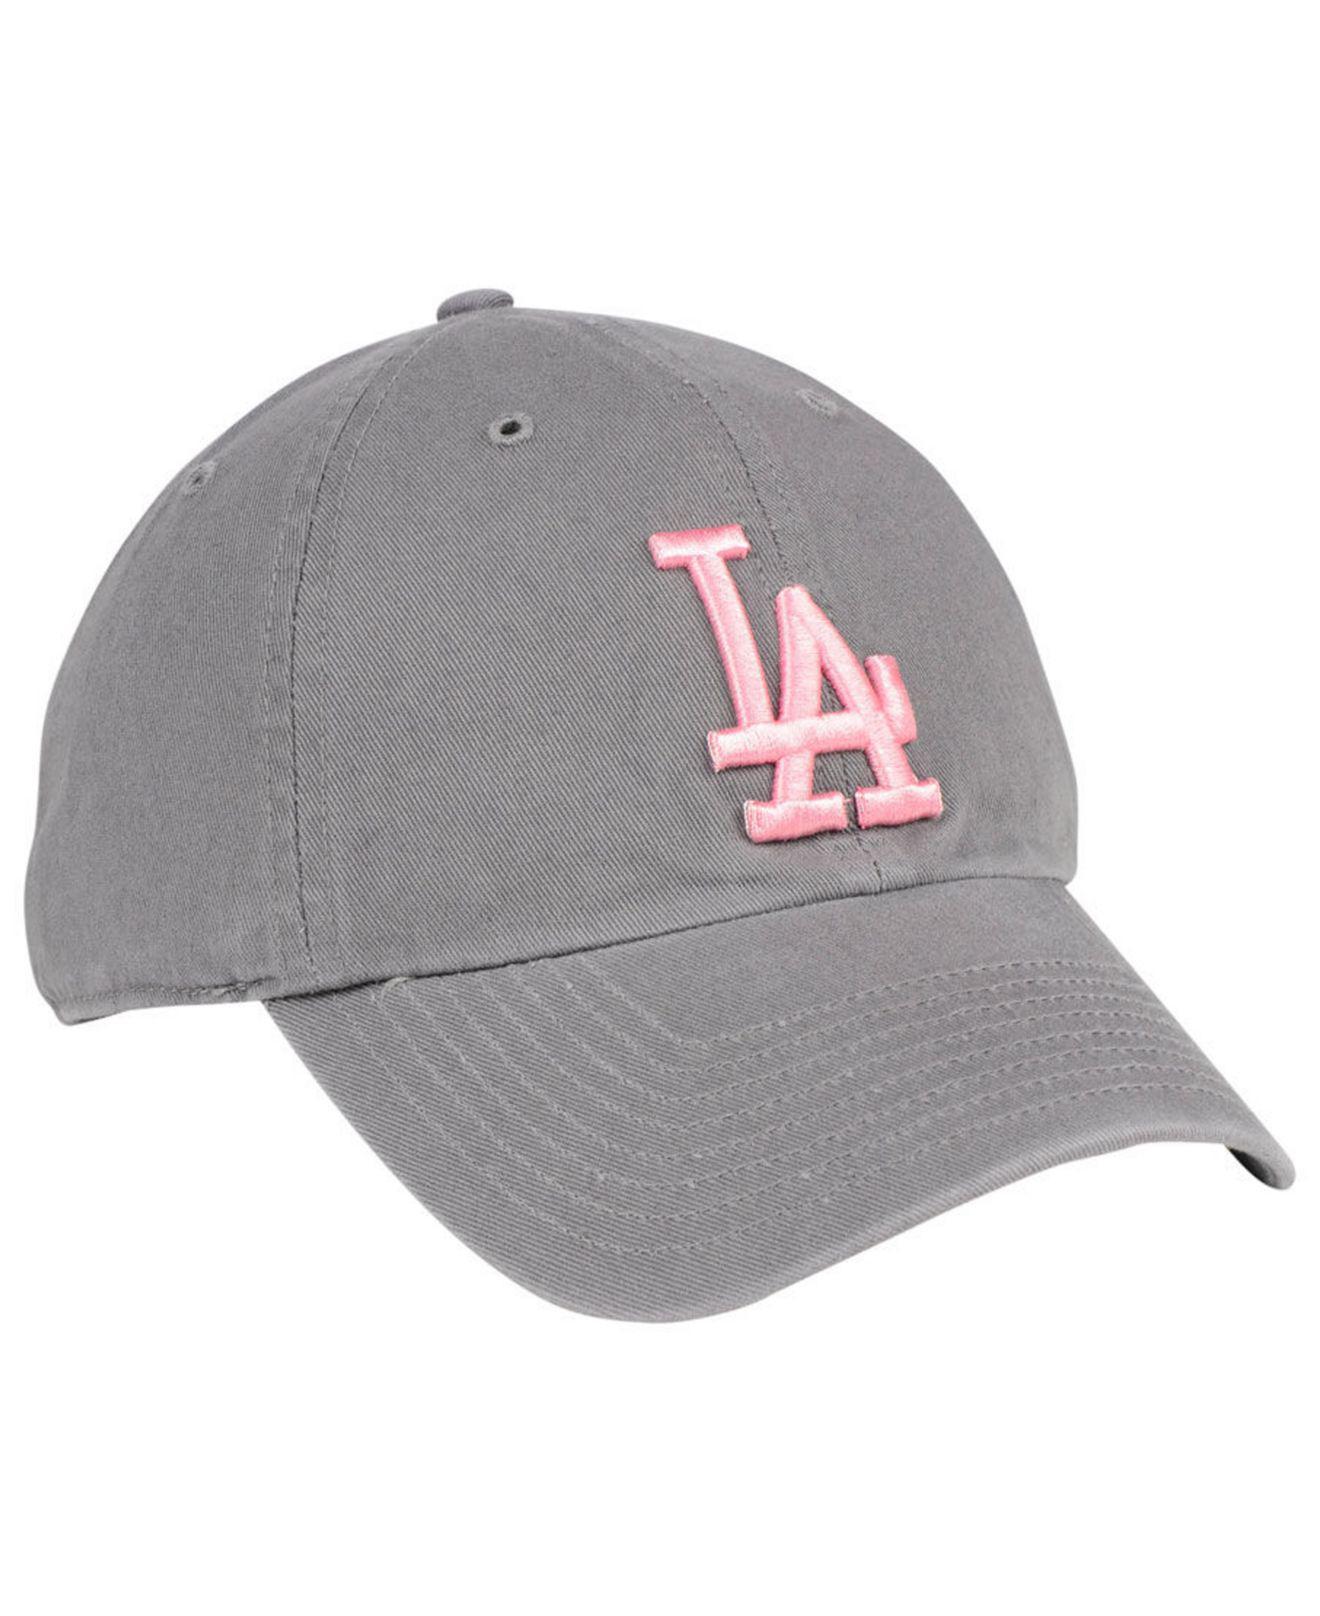 quality design 45cfa 962c1 47 Brand - Los Angeles Dodgers Dark Gray Pink Clean Up Cap - Lyst. View  fullscreen